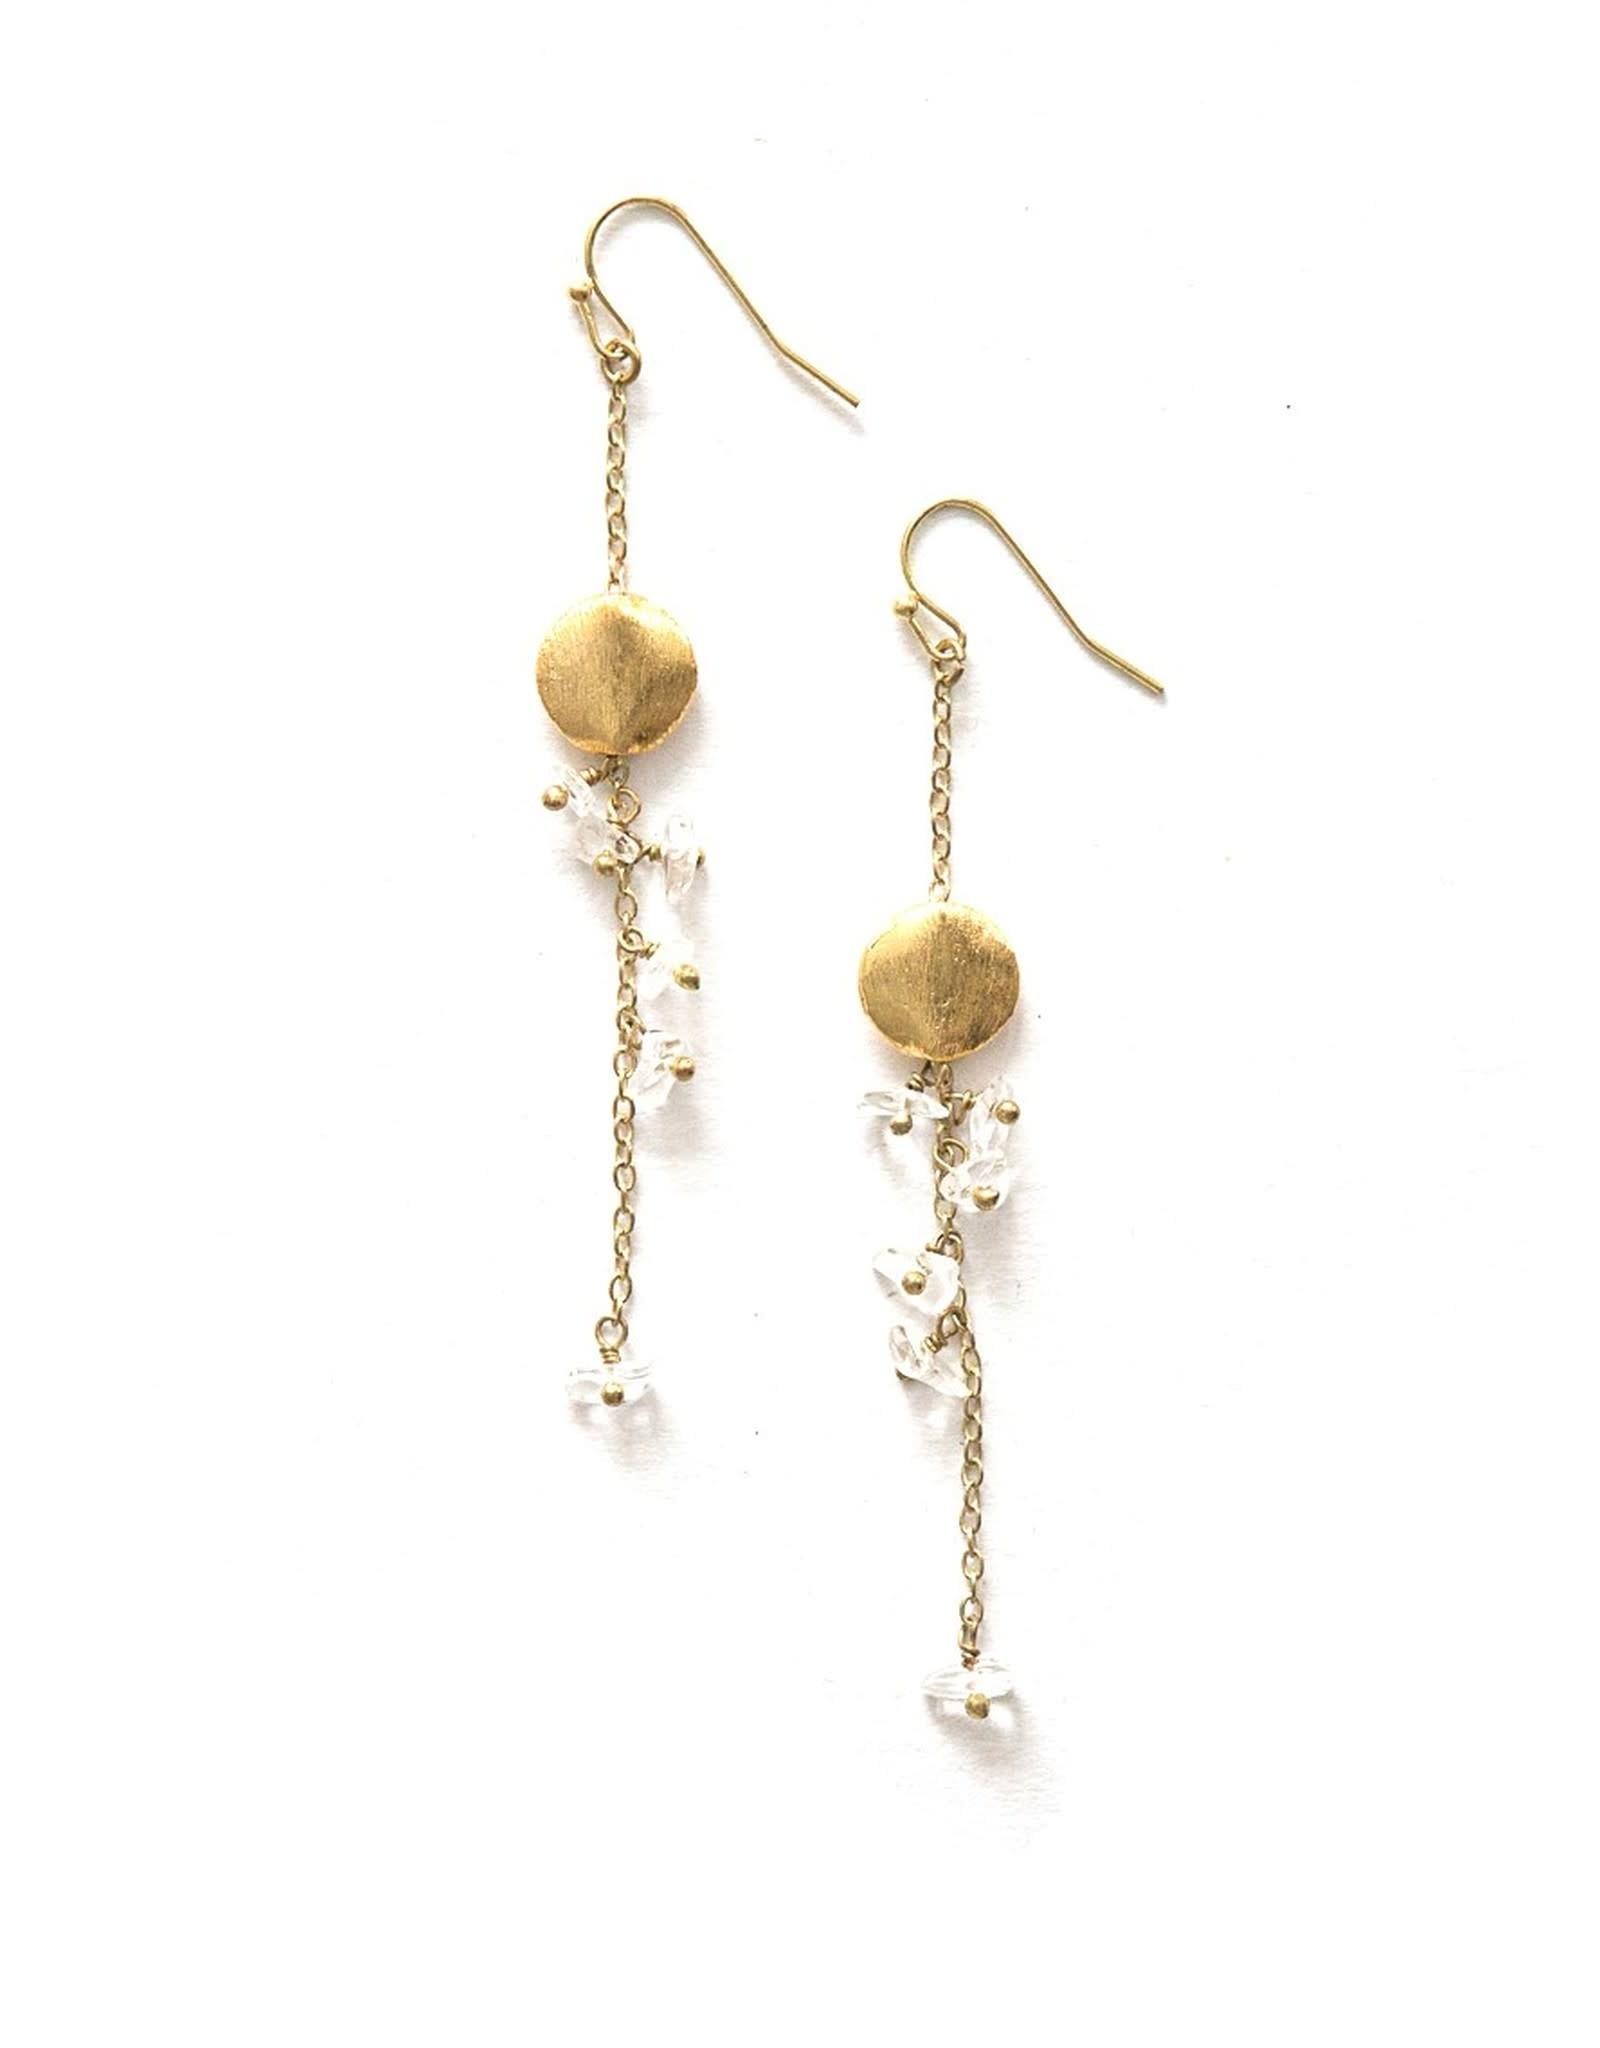 Delicate Dangle Stone Earrings, India